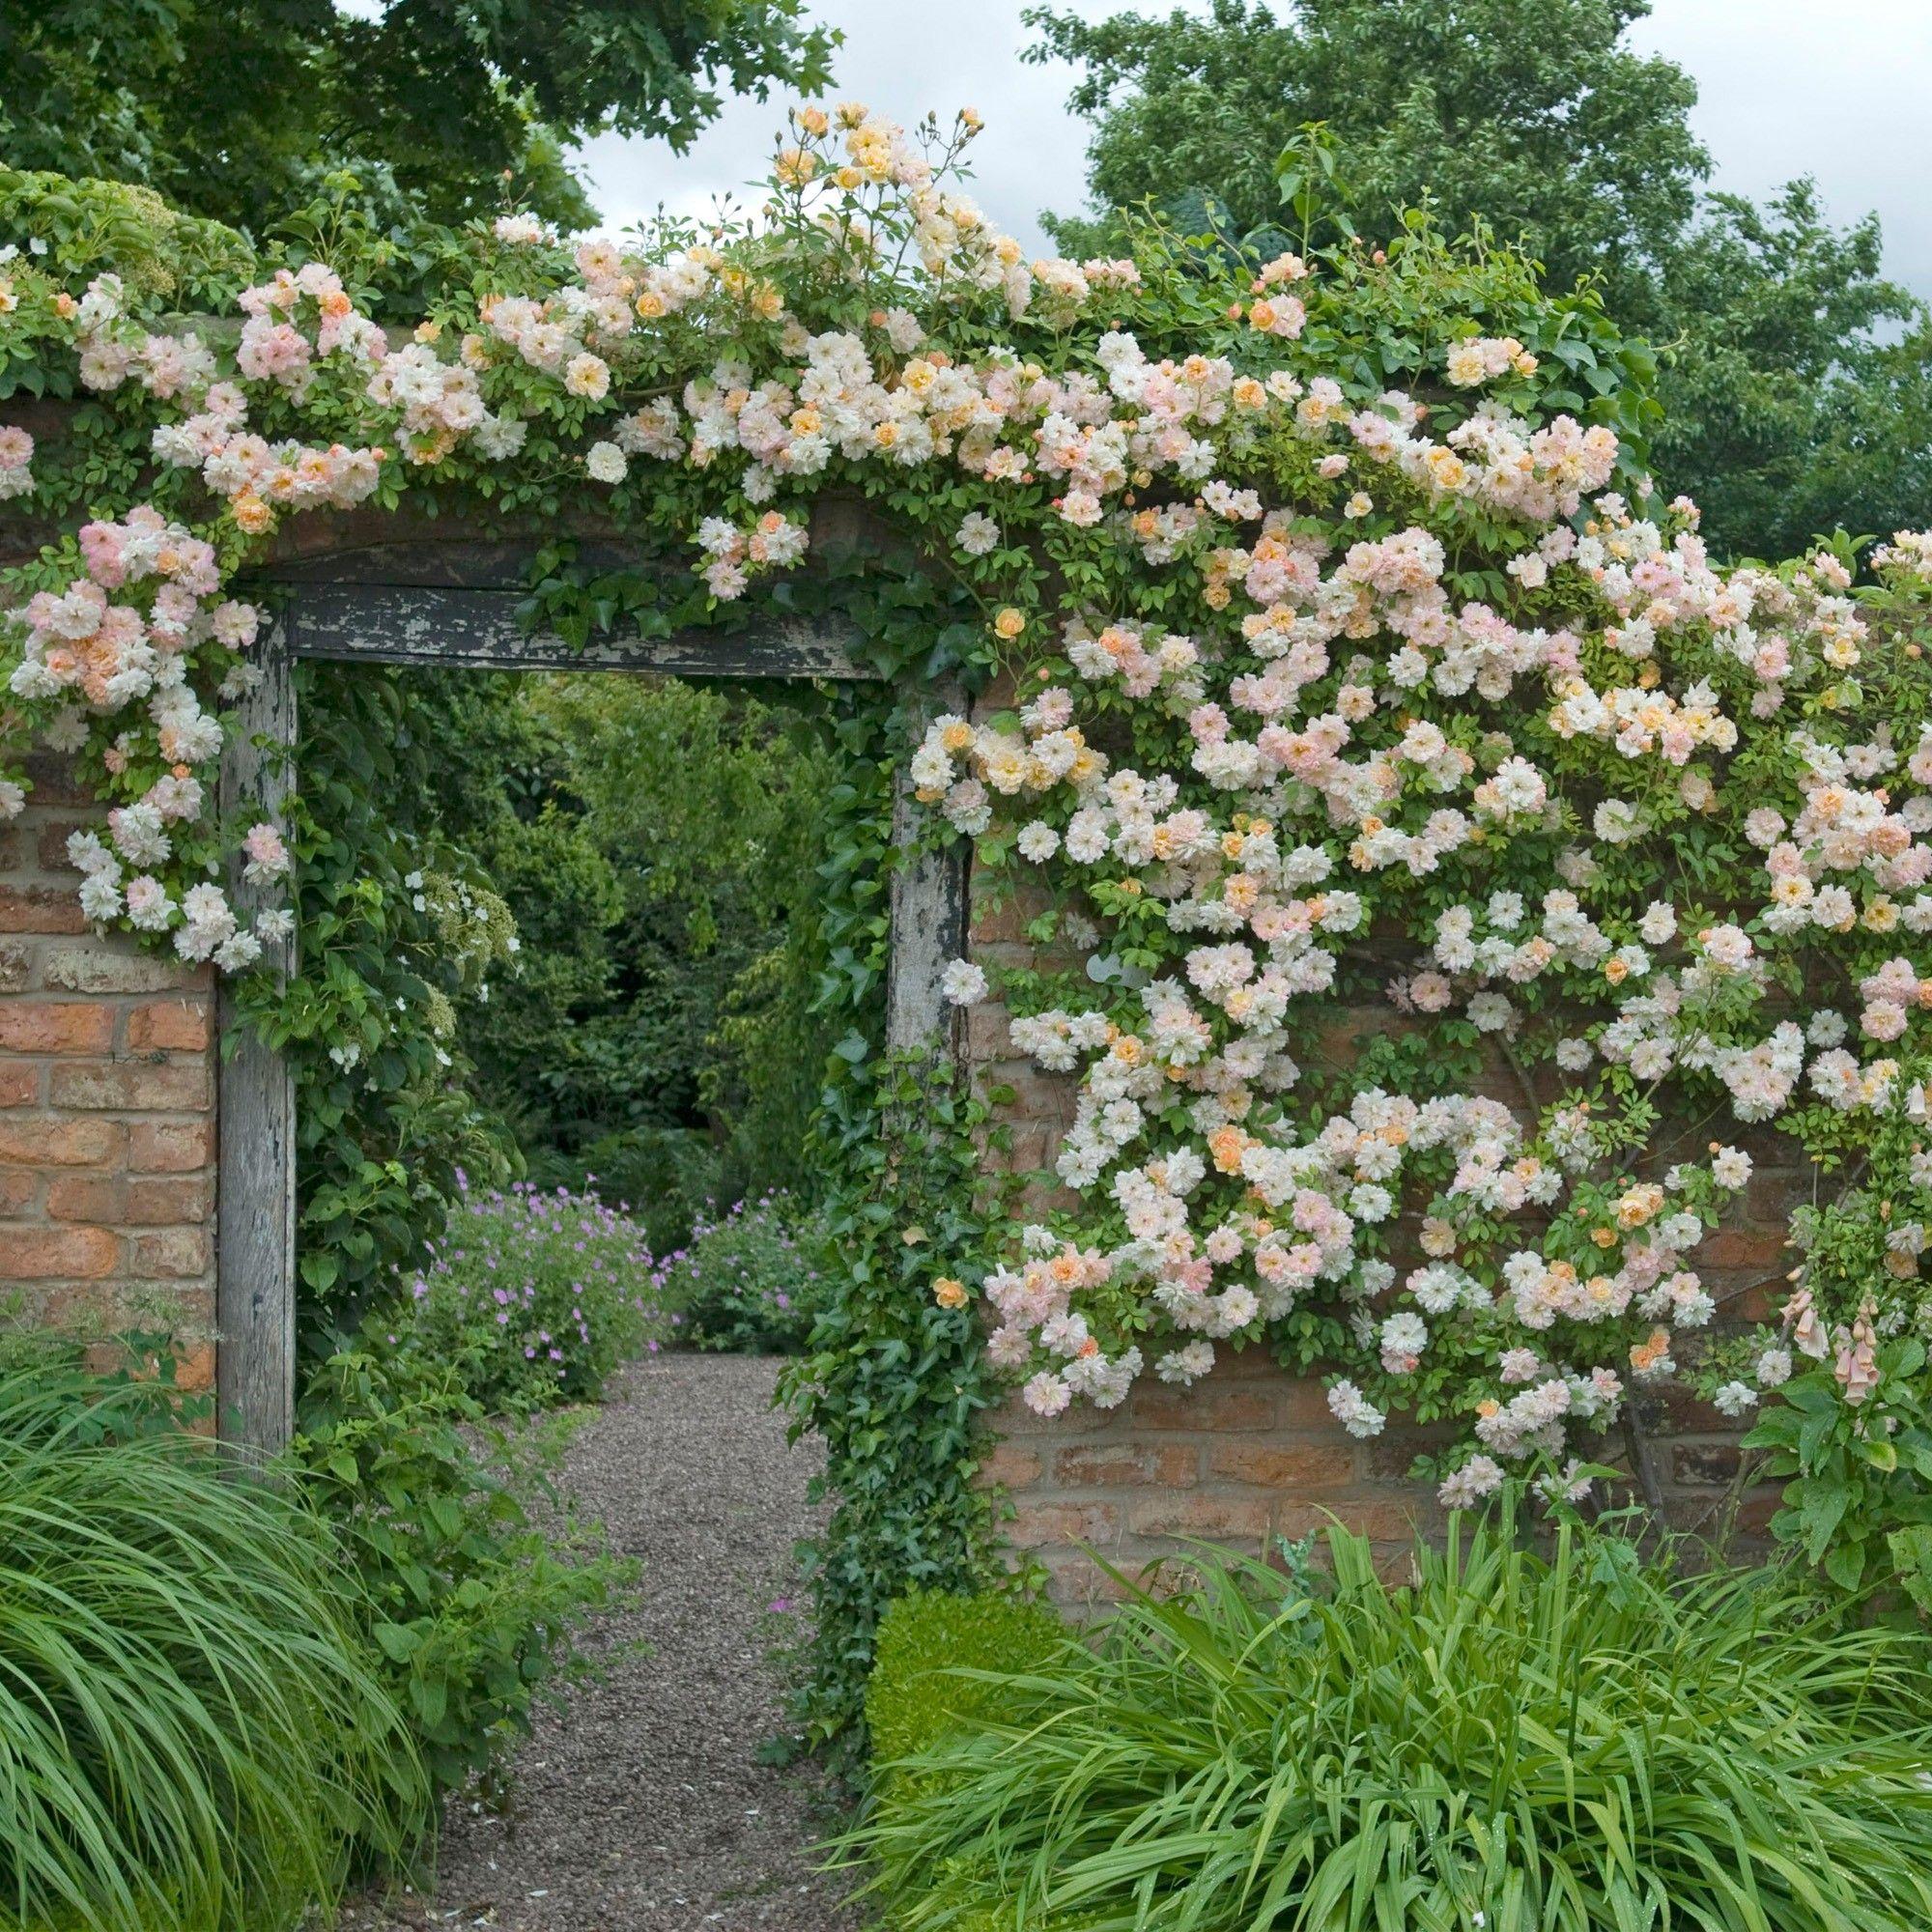 Phyllis Bide rambler, scented, repeat bloomer, 15 feet